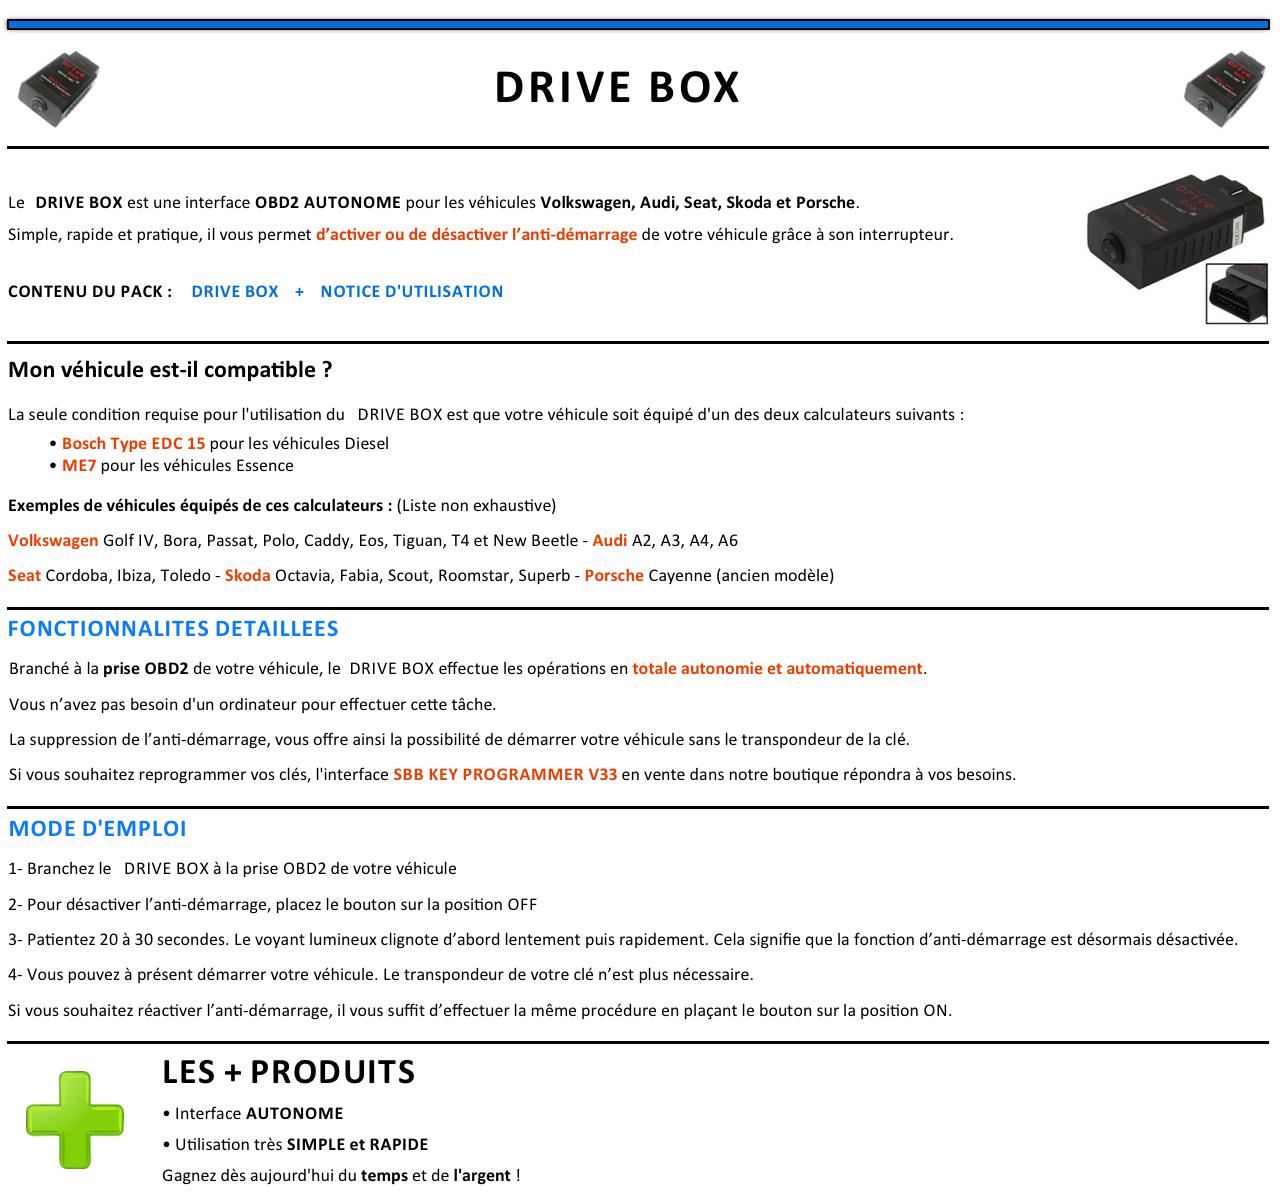 vag drive box desactivation anti demarrage obd2 programmation obd ebay. Black Bedroom Furniture Sets. Home Design Ideas